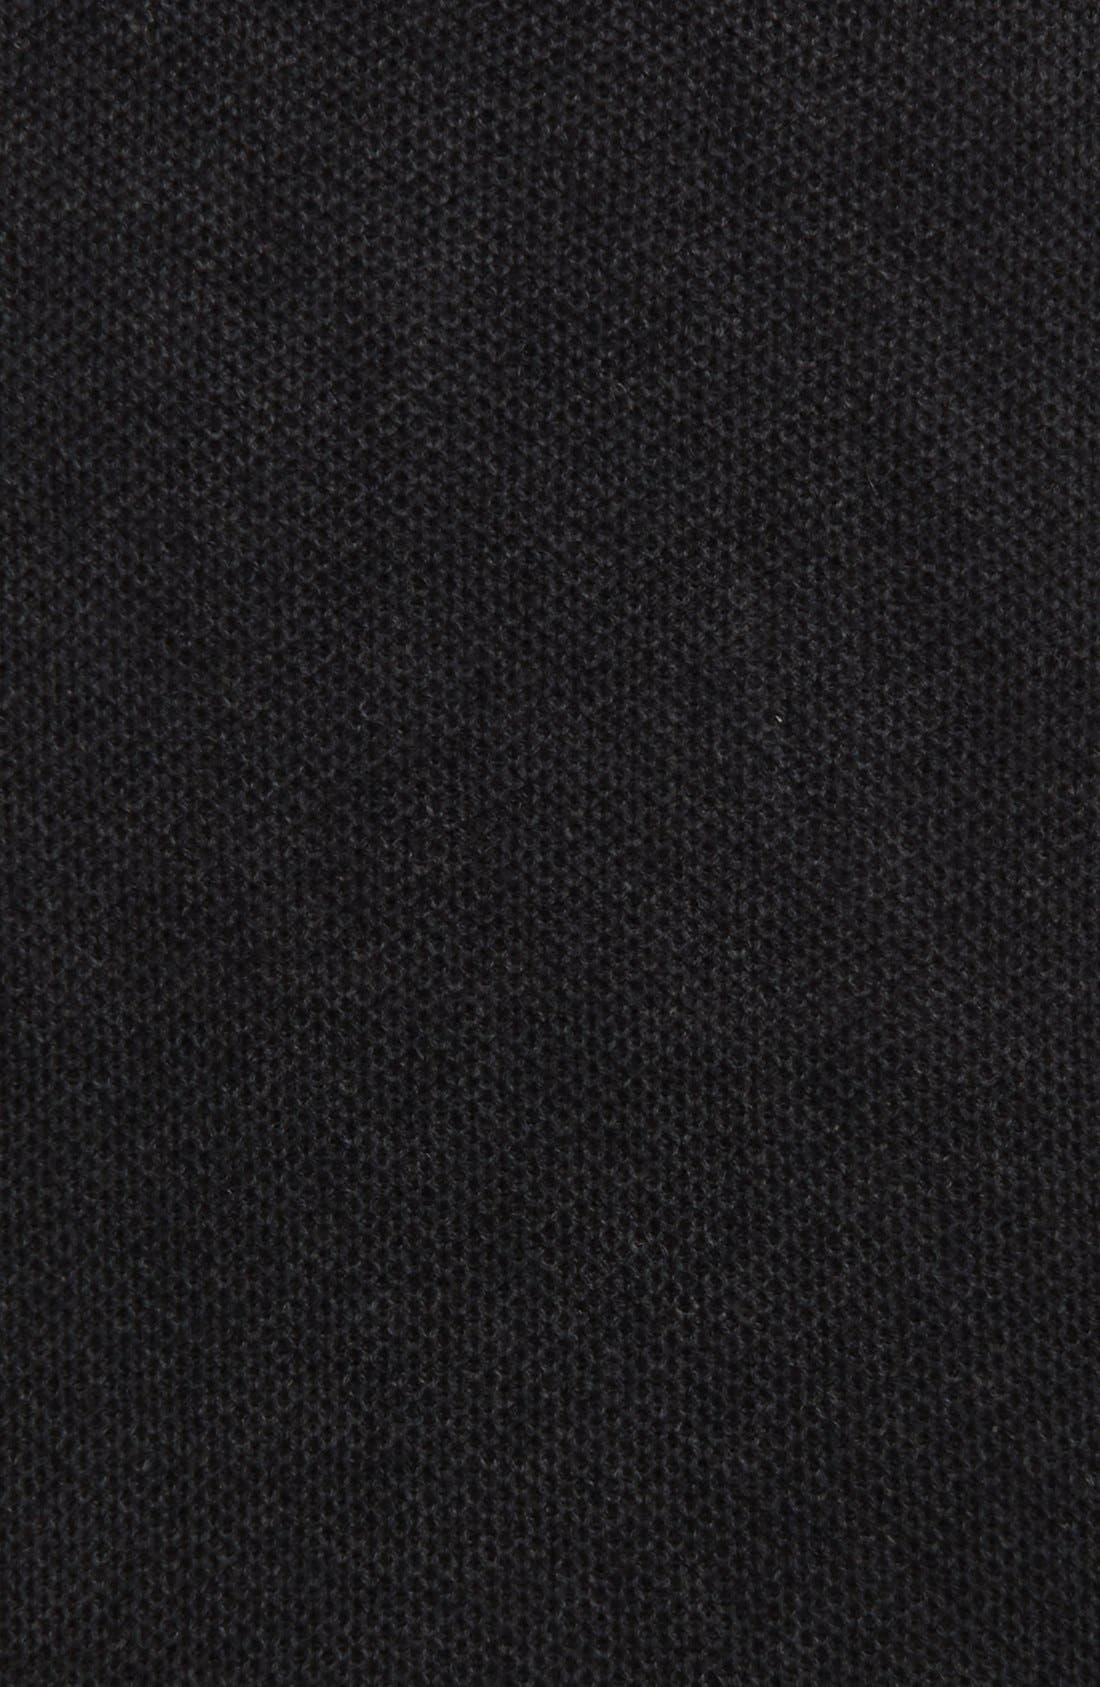 Alternate Image 3  - Halogen® Knit Cashmere Infinity Scarf